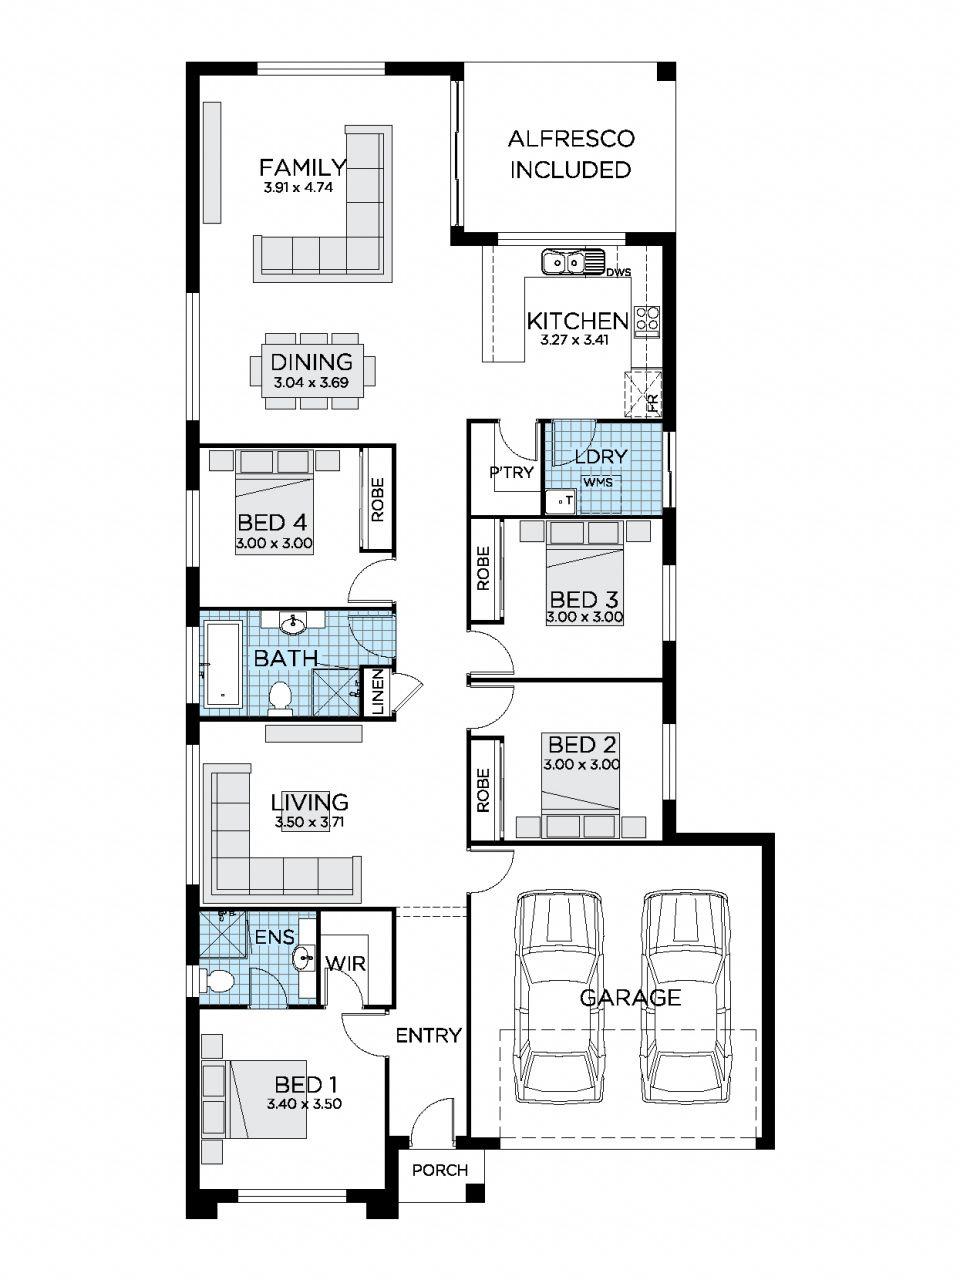 77 House Floor Plan Designer 2019 4 Bedroom House Plans House Plans With Pictures Floor Plan Design